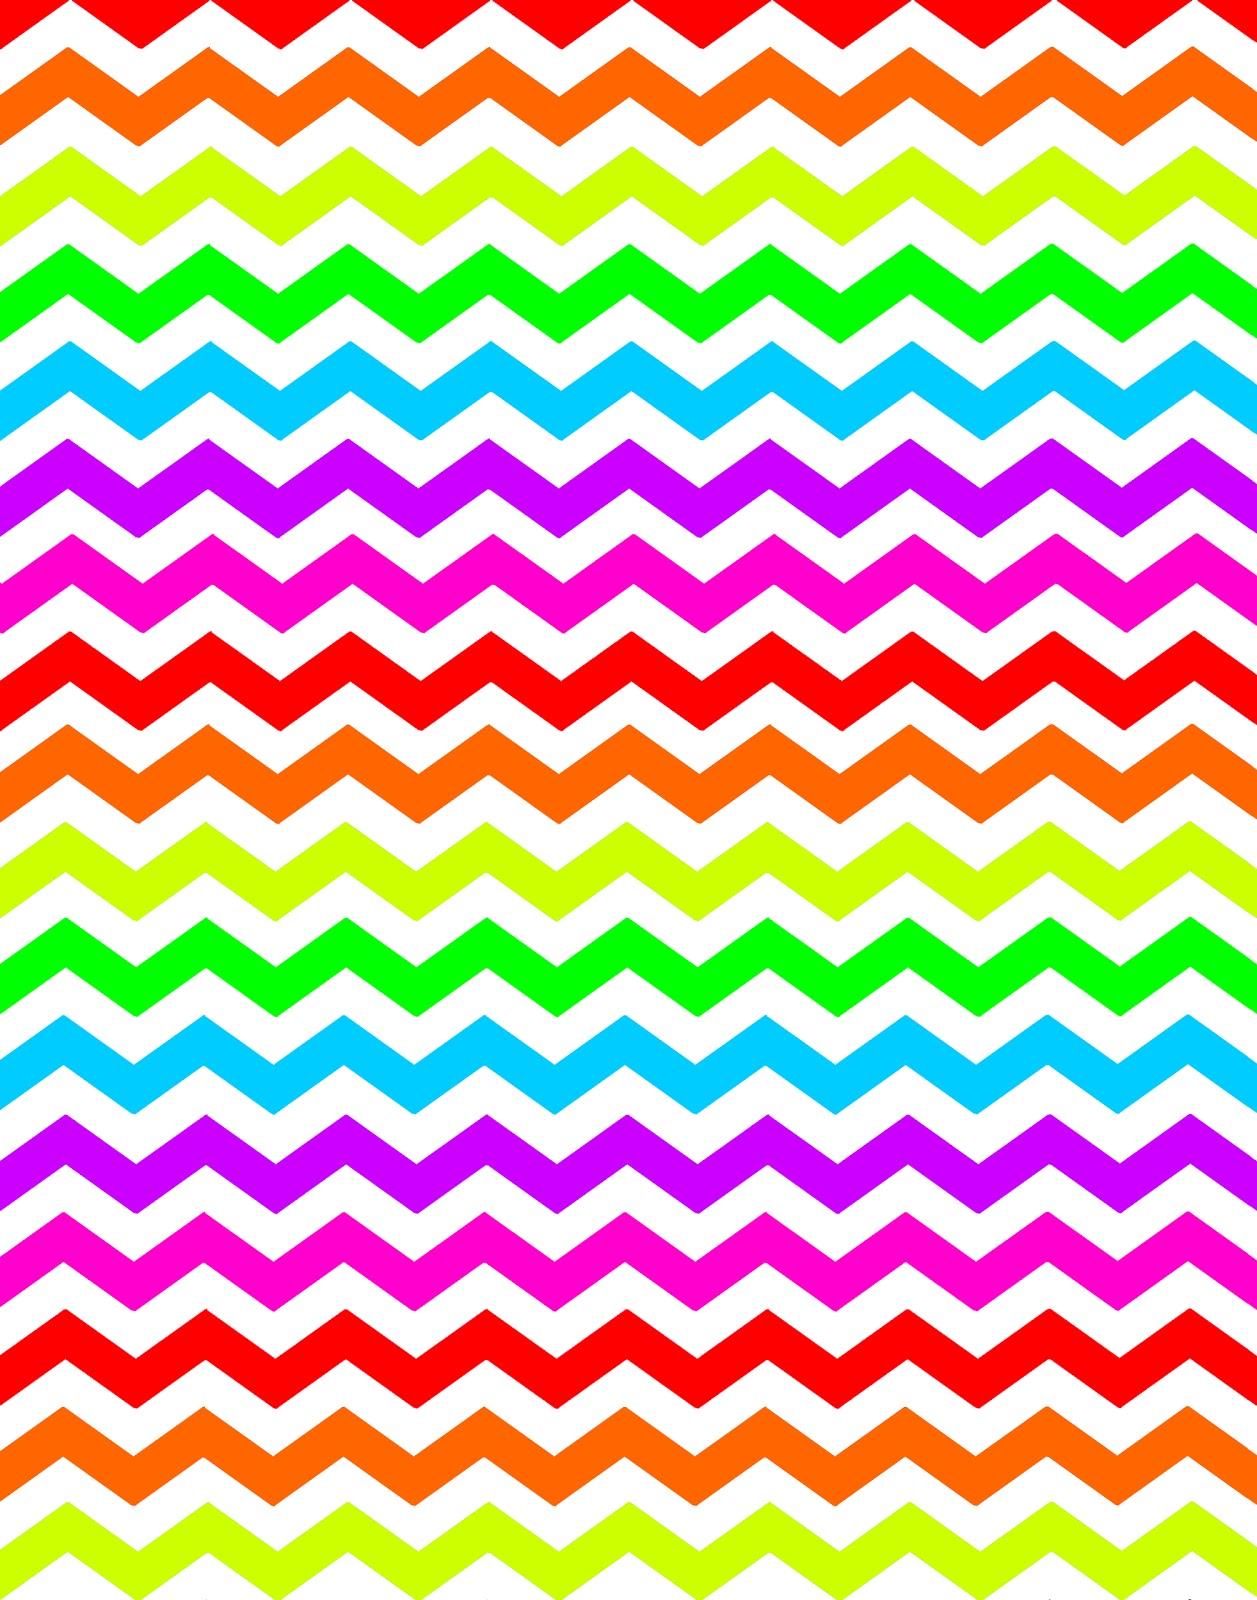 Chevron clipart rainbow. Doodlecraft new colors background